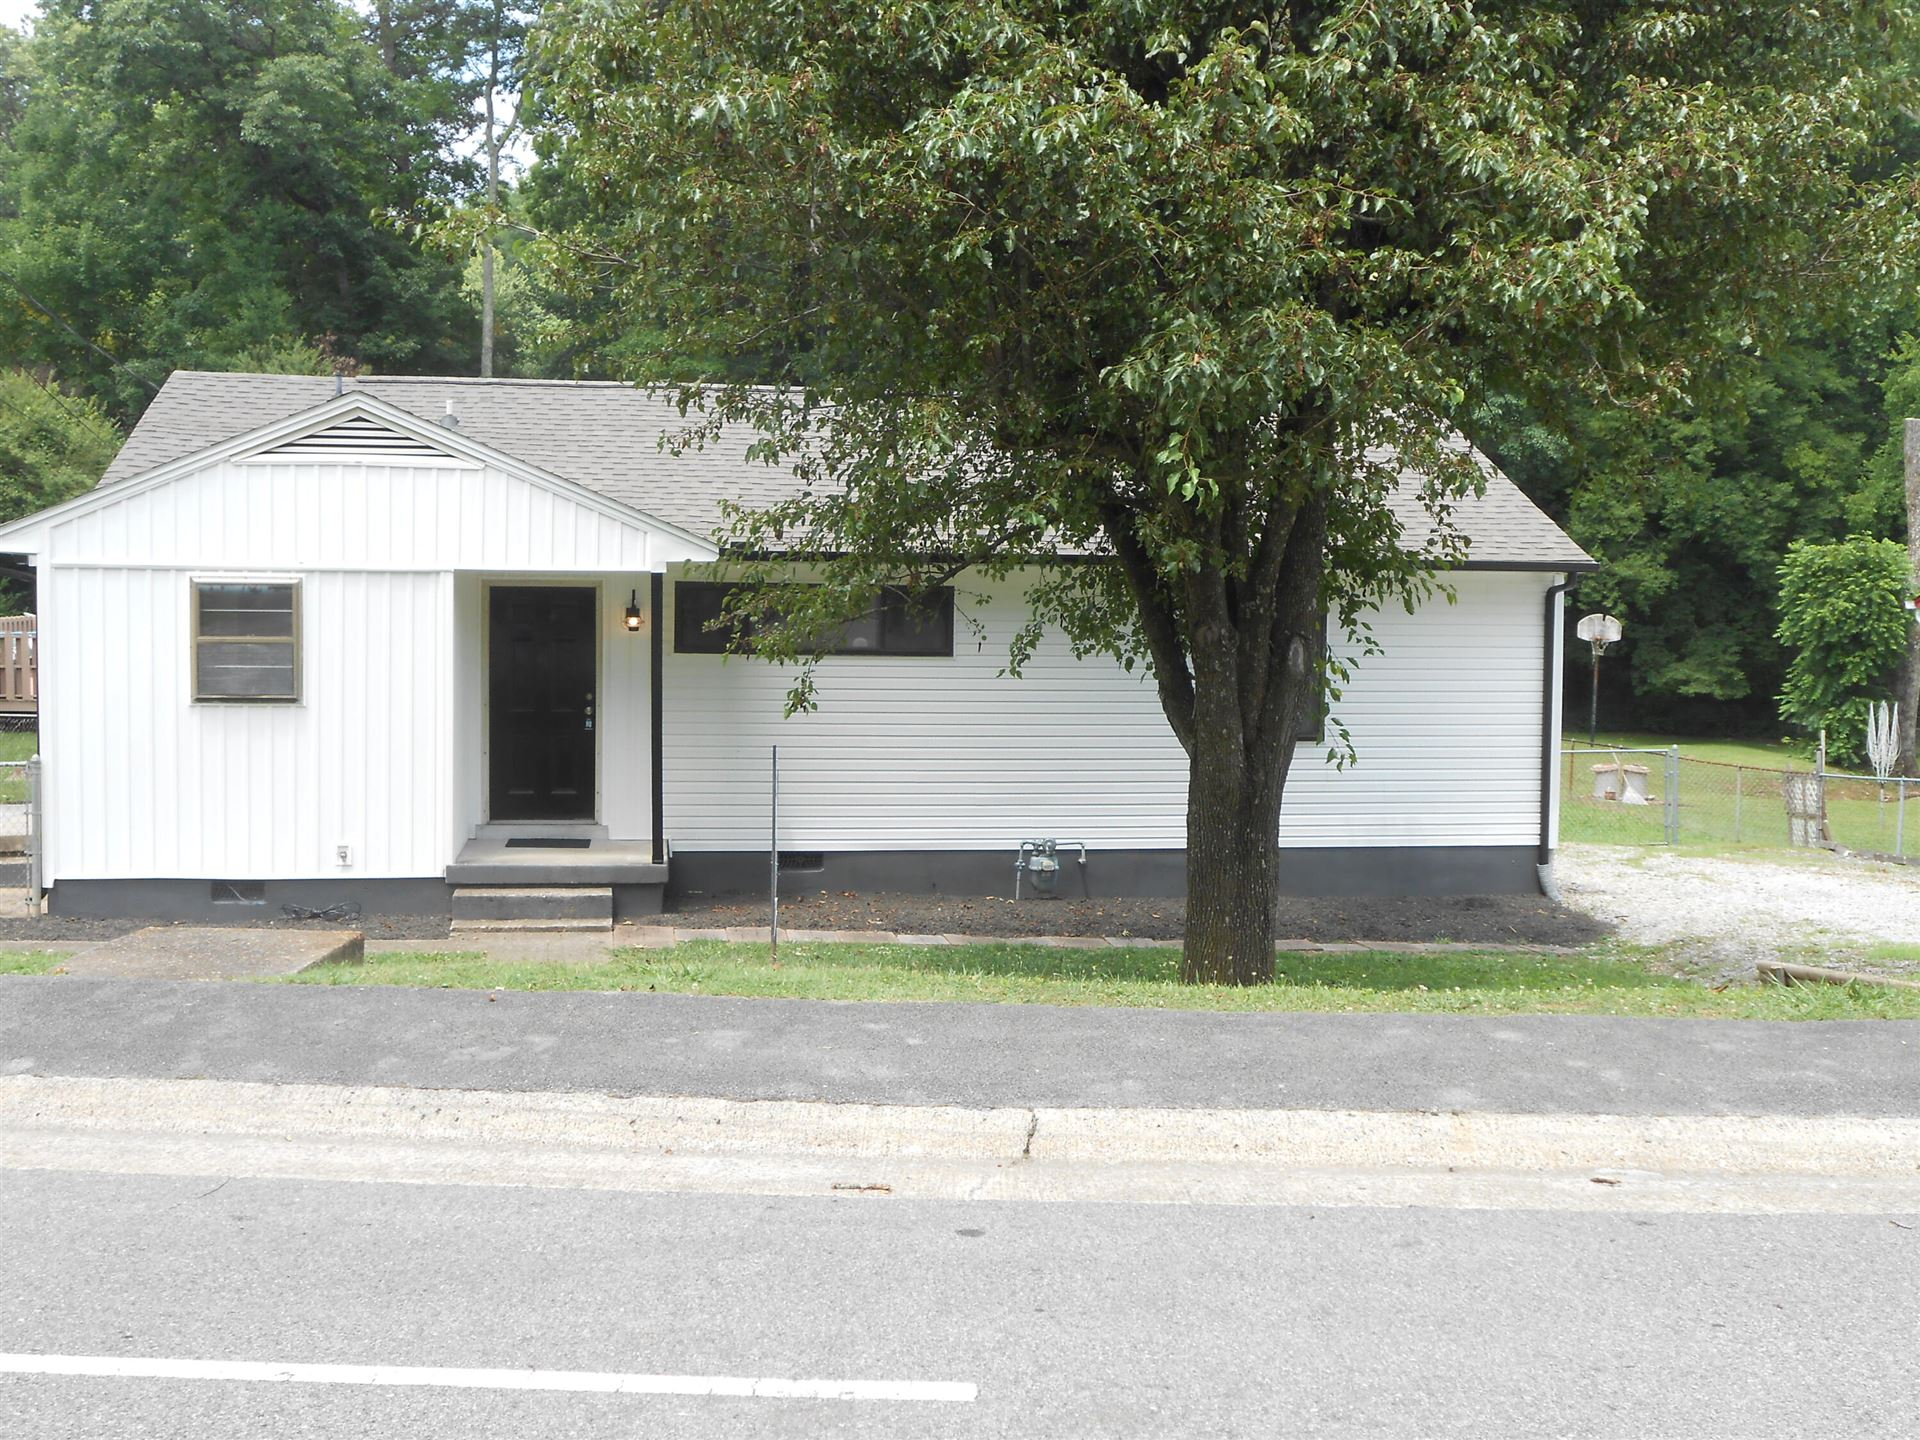 Photo of 266 East Drive, Oak Ridge, TN 37830 (MLS # 1160109)